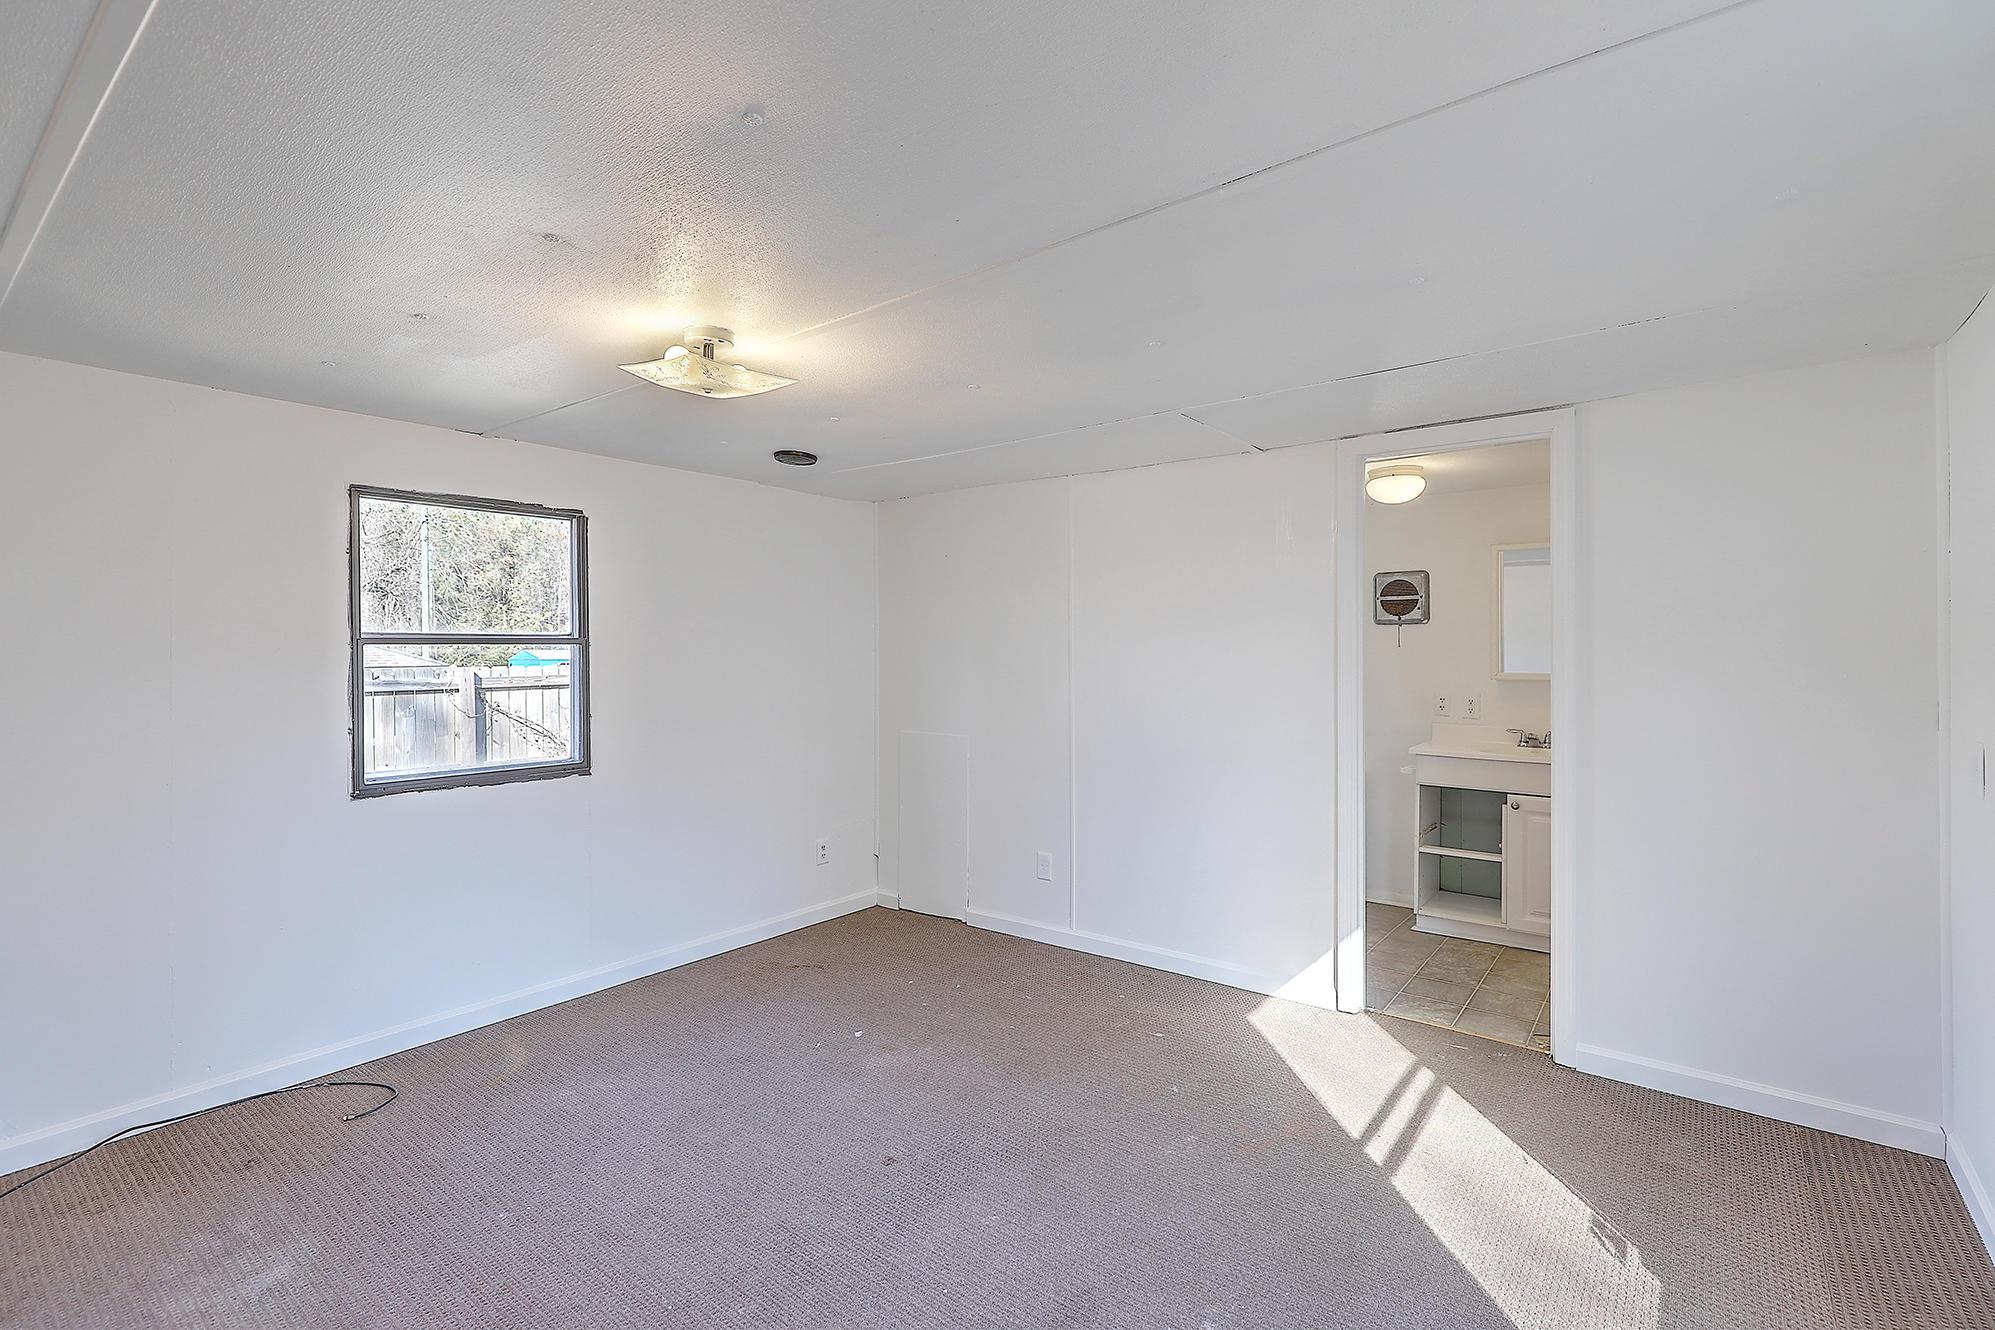 Caromi Village Homes For Sale - 323 Raymond, Ladson, SC - 17